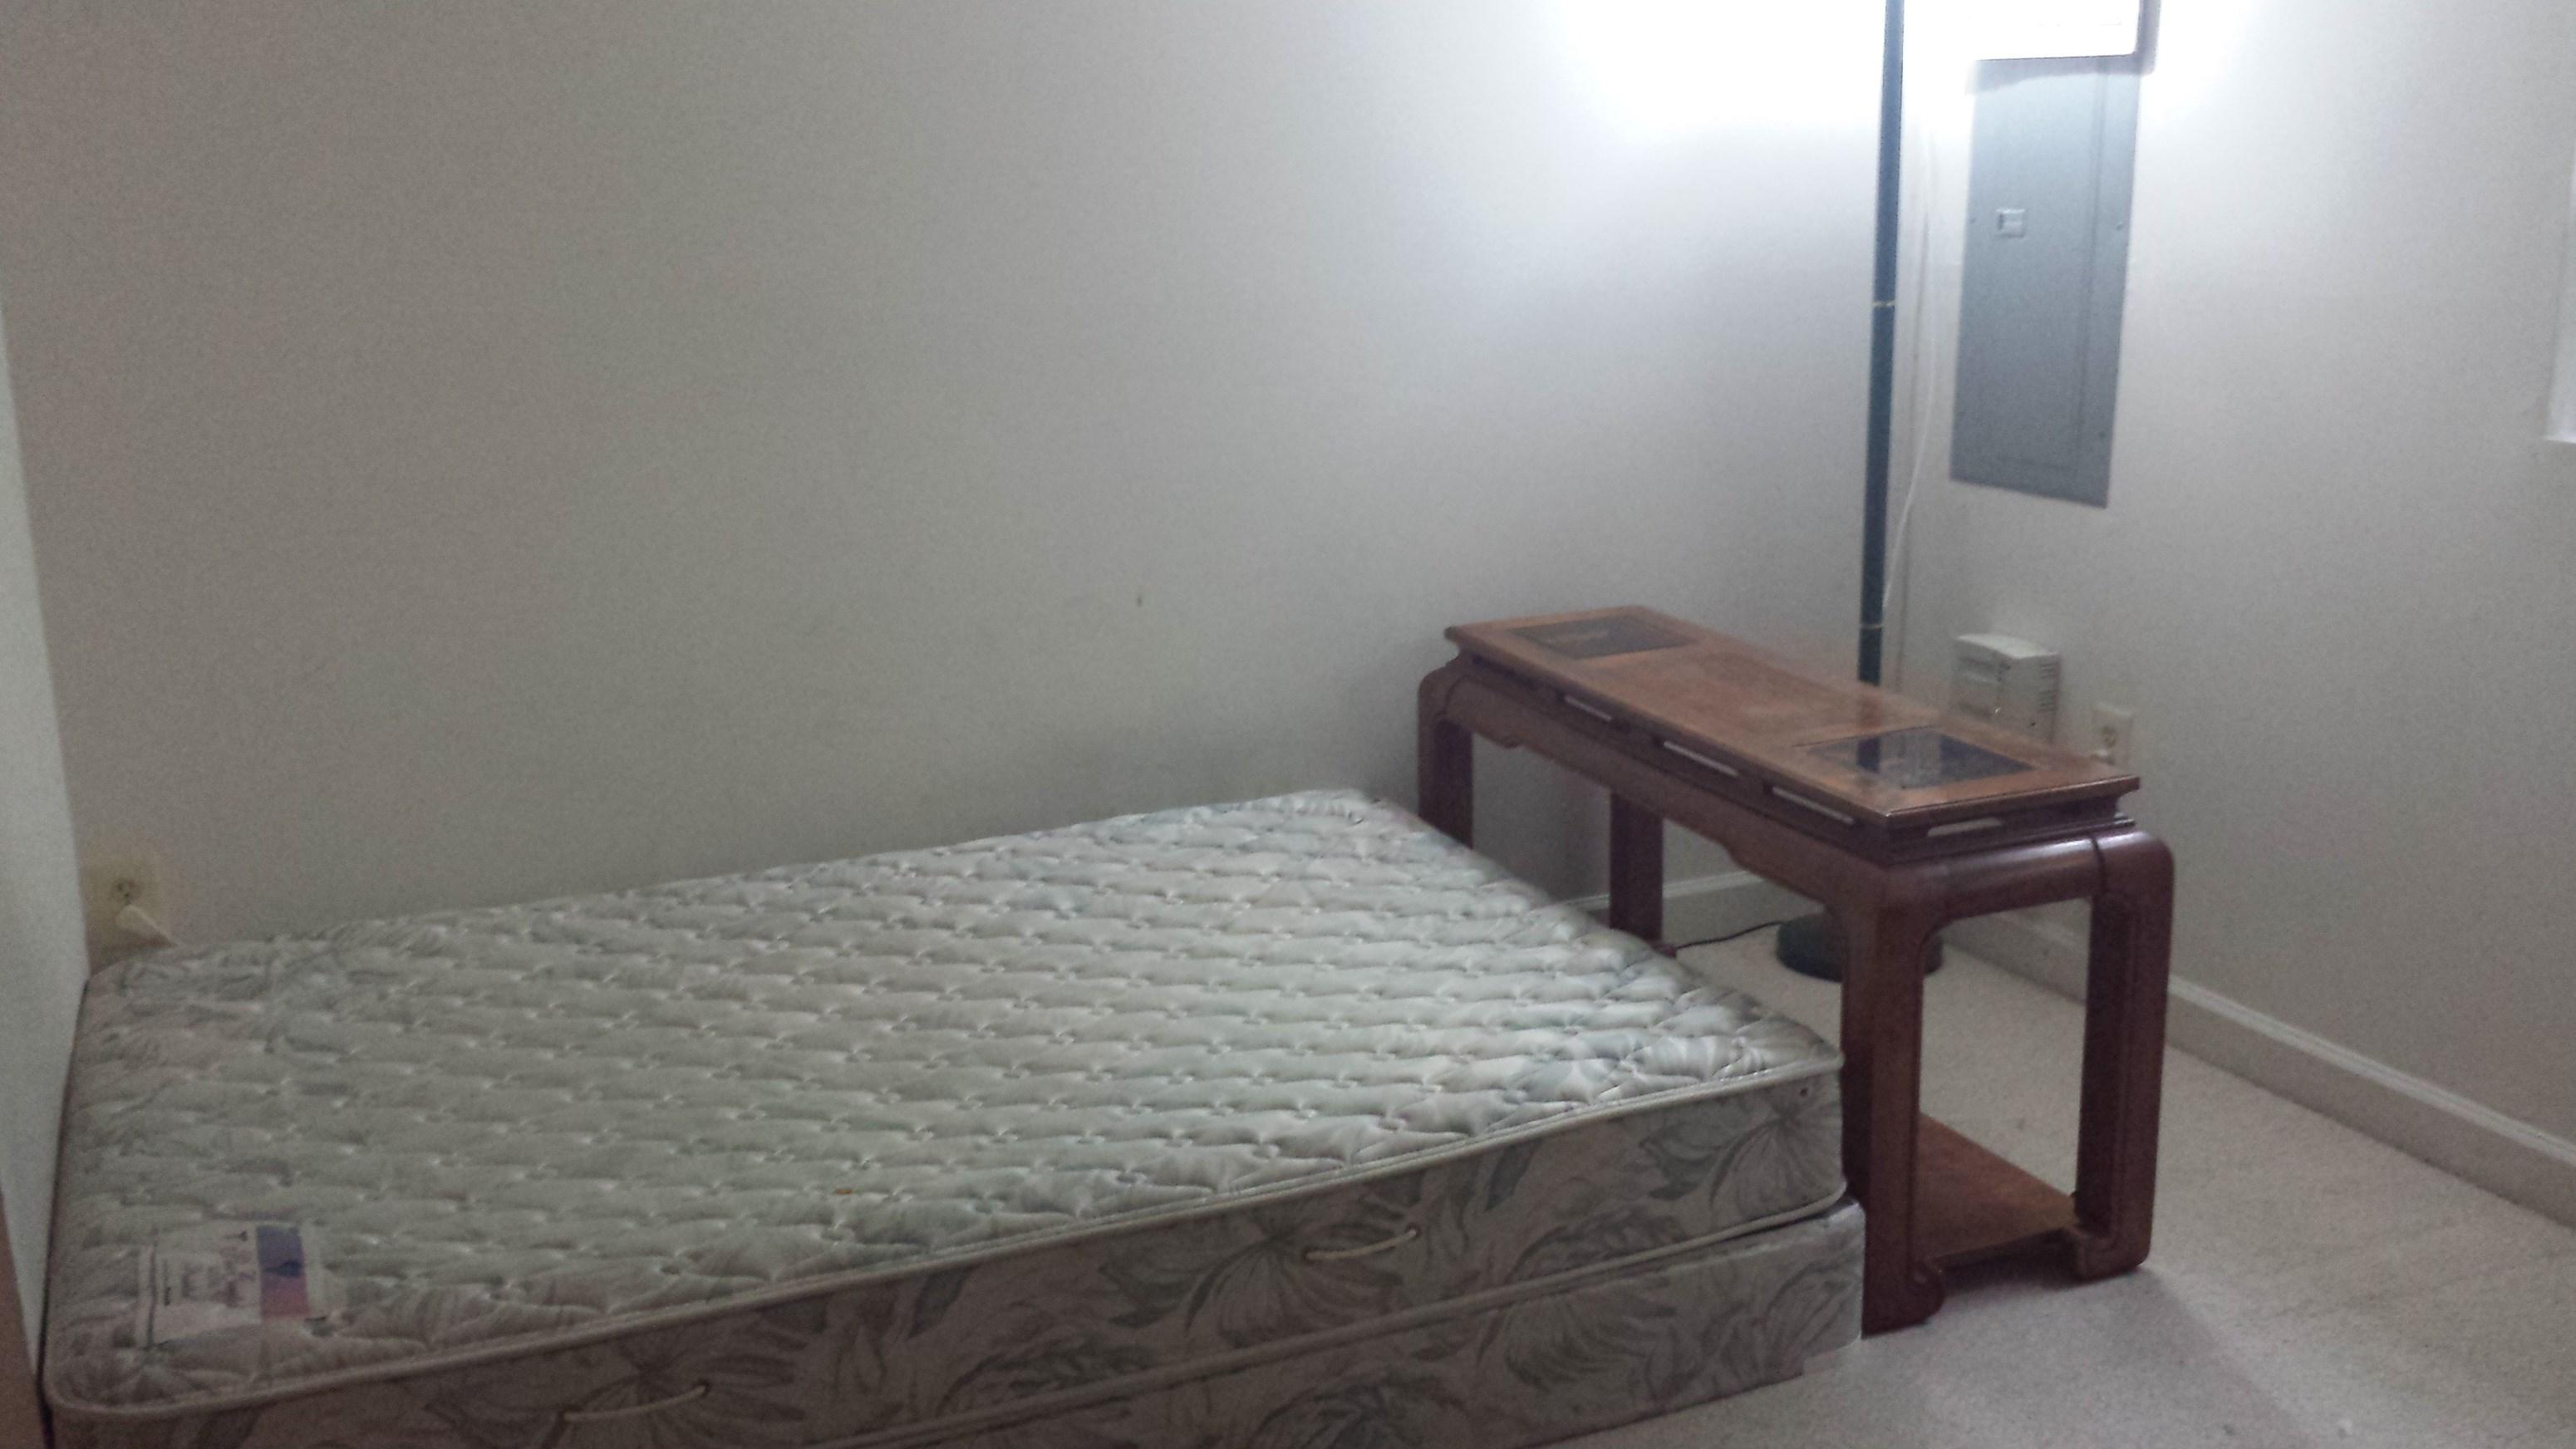 Room For Rent In Burtonsville MD In Burtonsville MD 849270 Sulekha Roomm